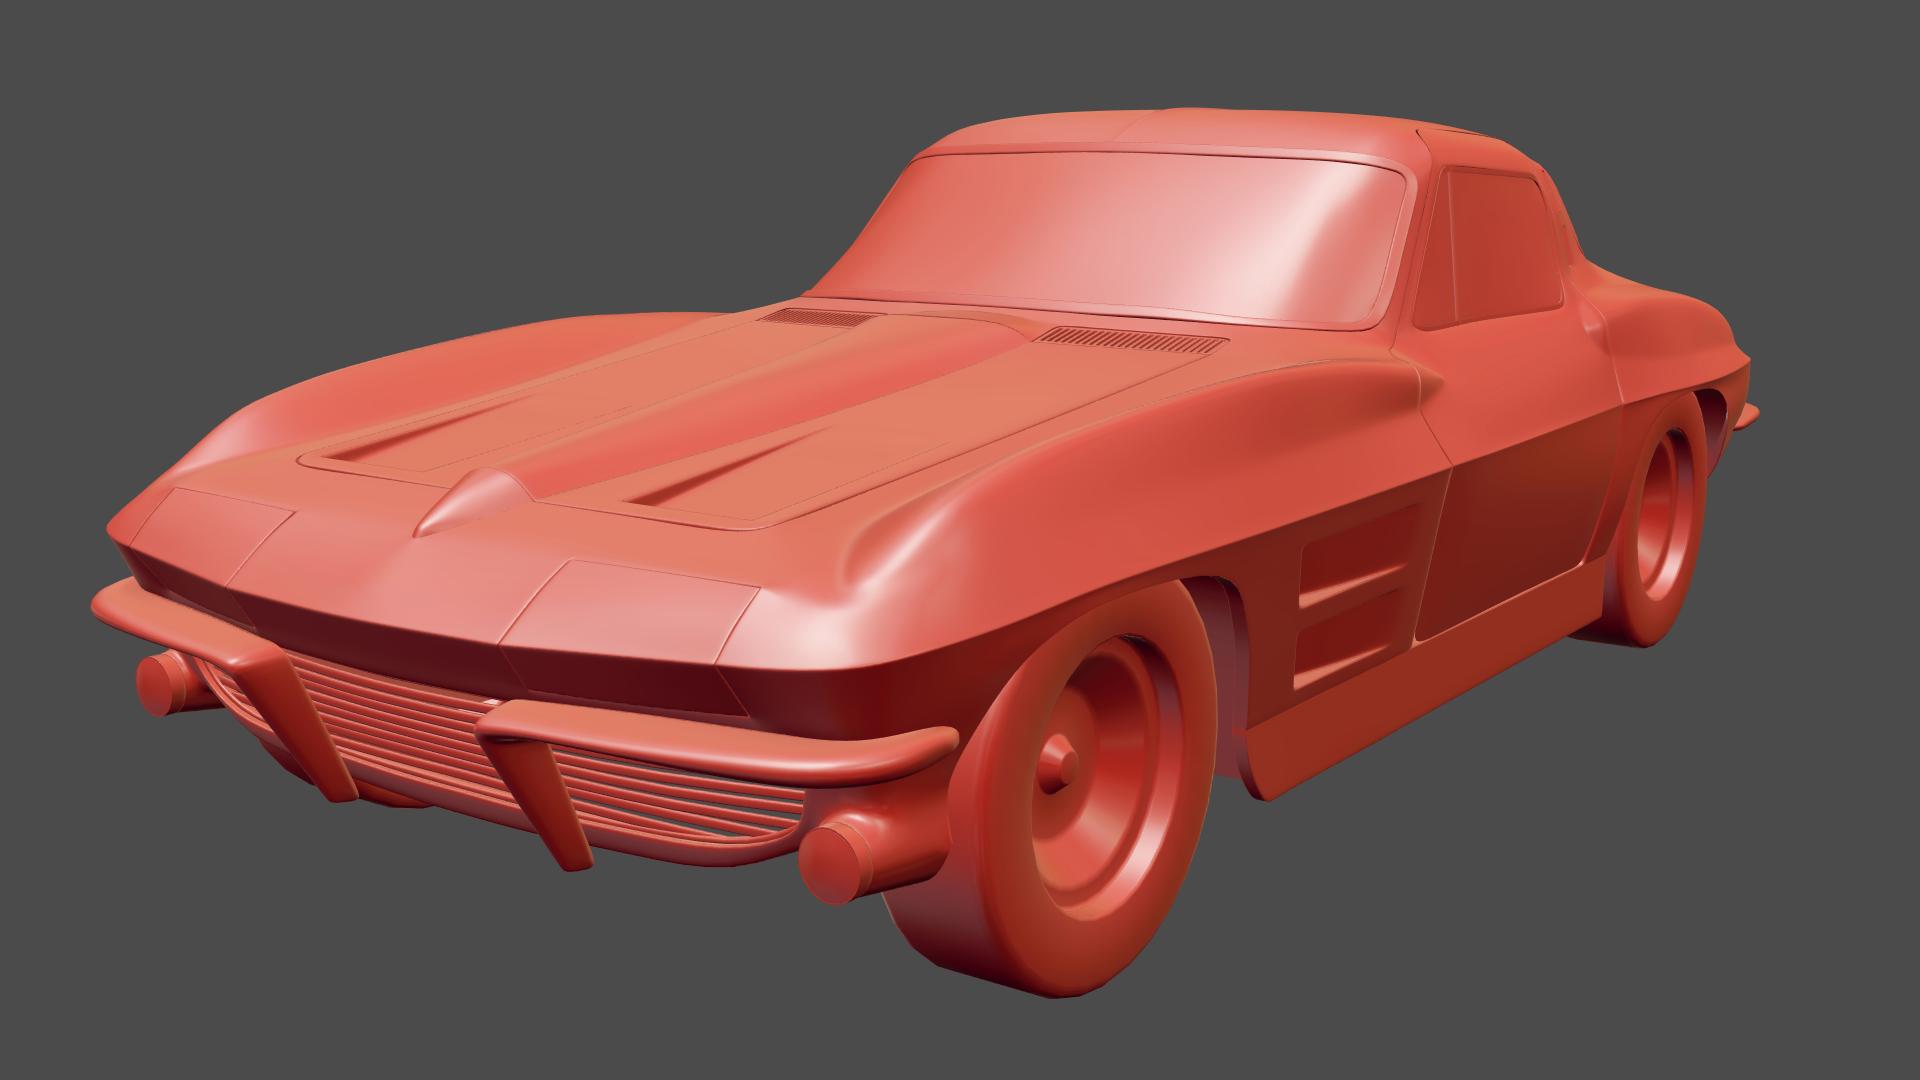 Chevrolet Corvette C2 coupe